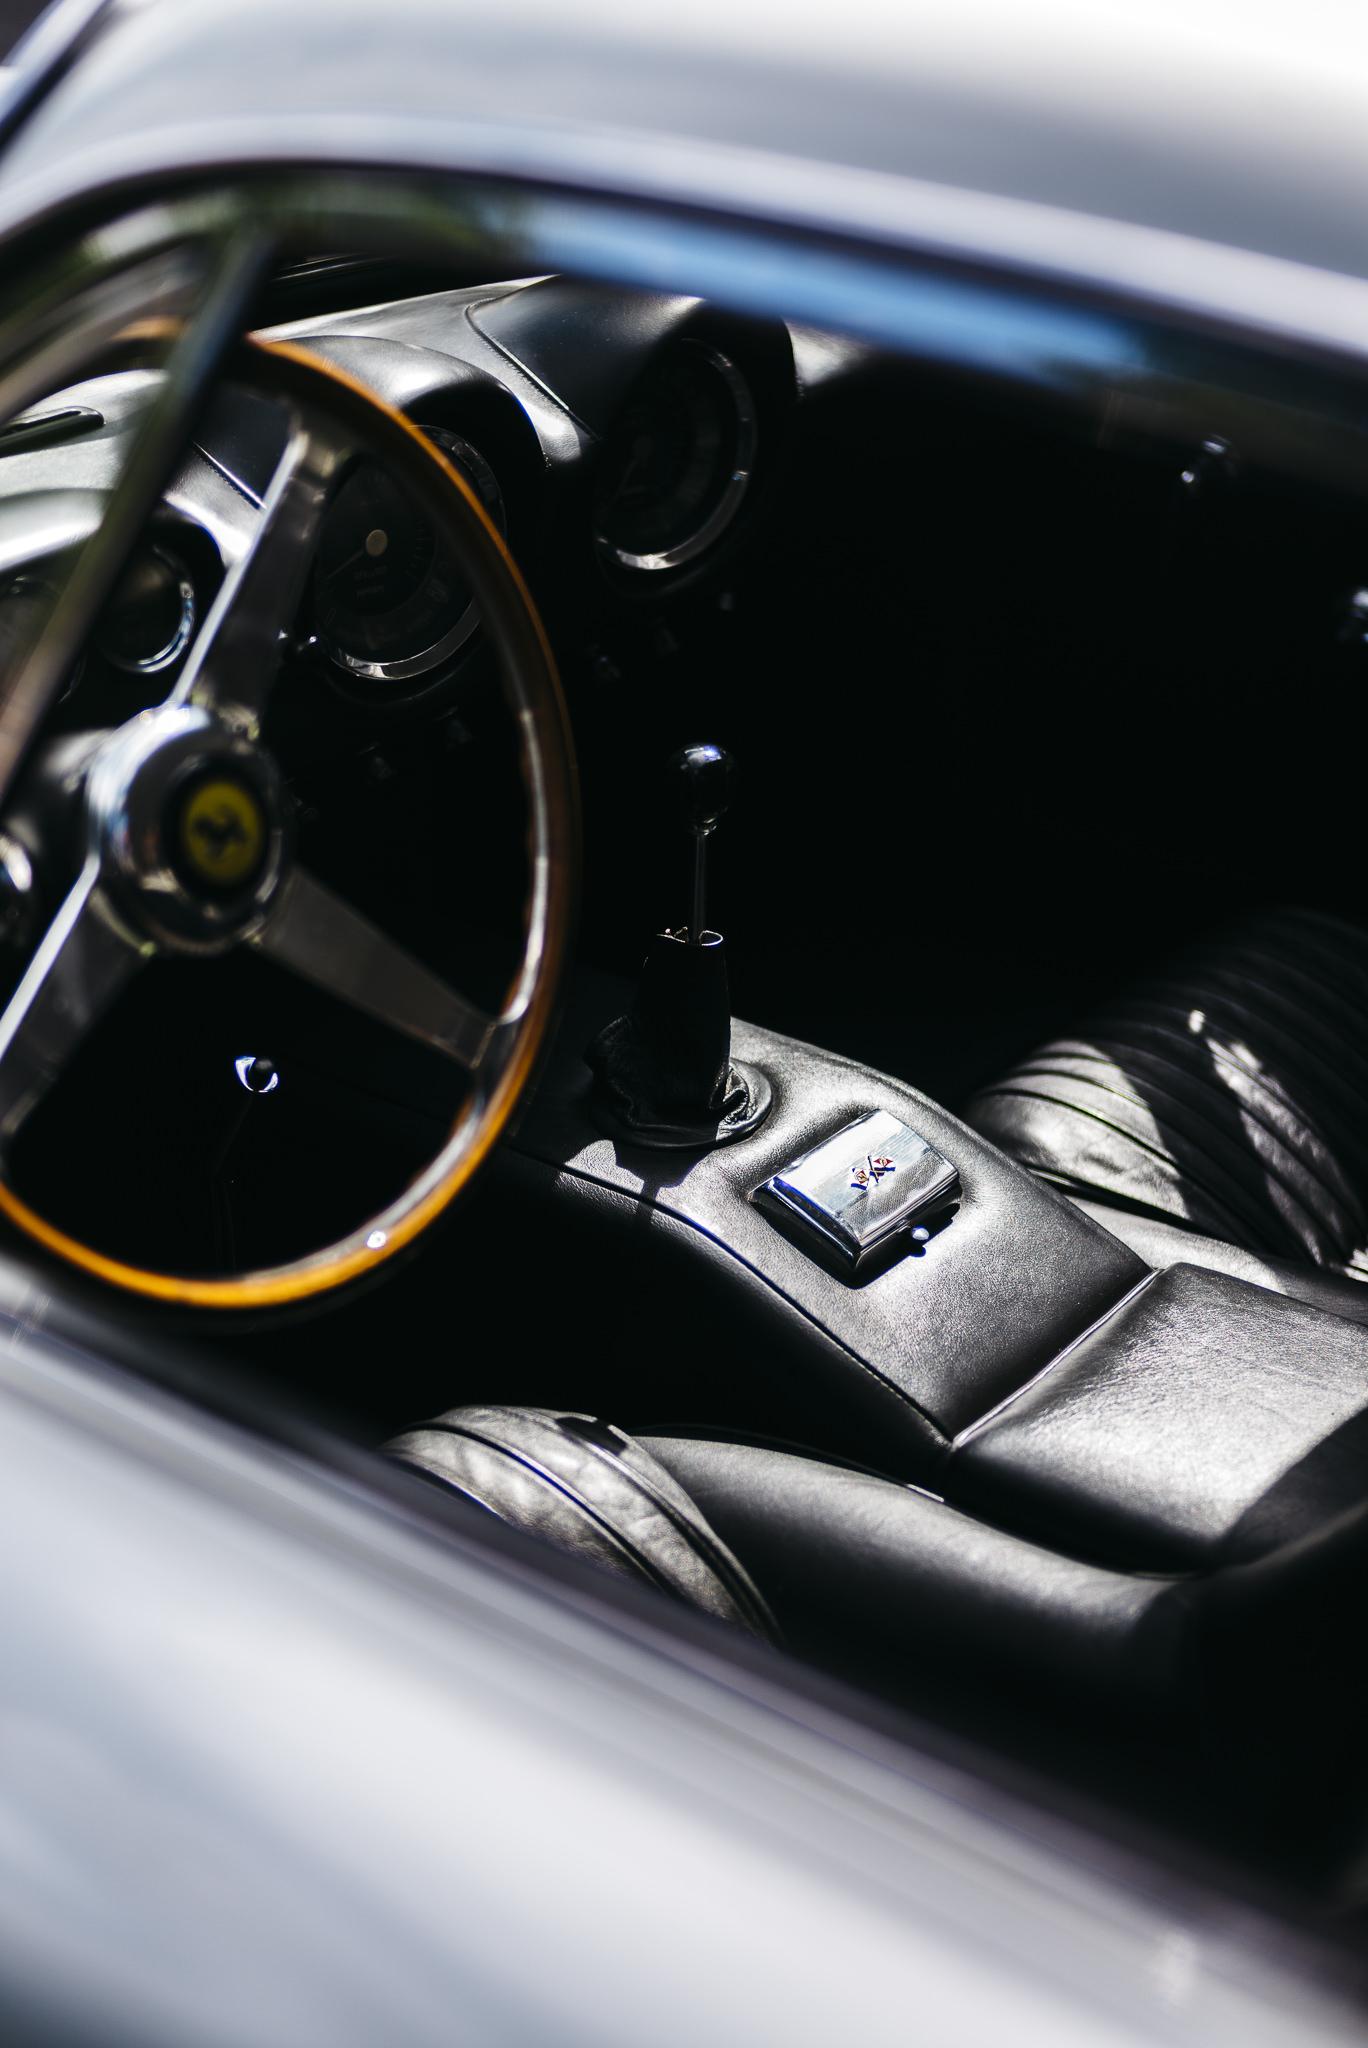 Ferrari 250. Shot with Leica M240 + Voigtlander 50mm F1.5.